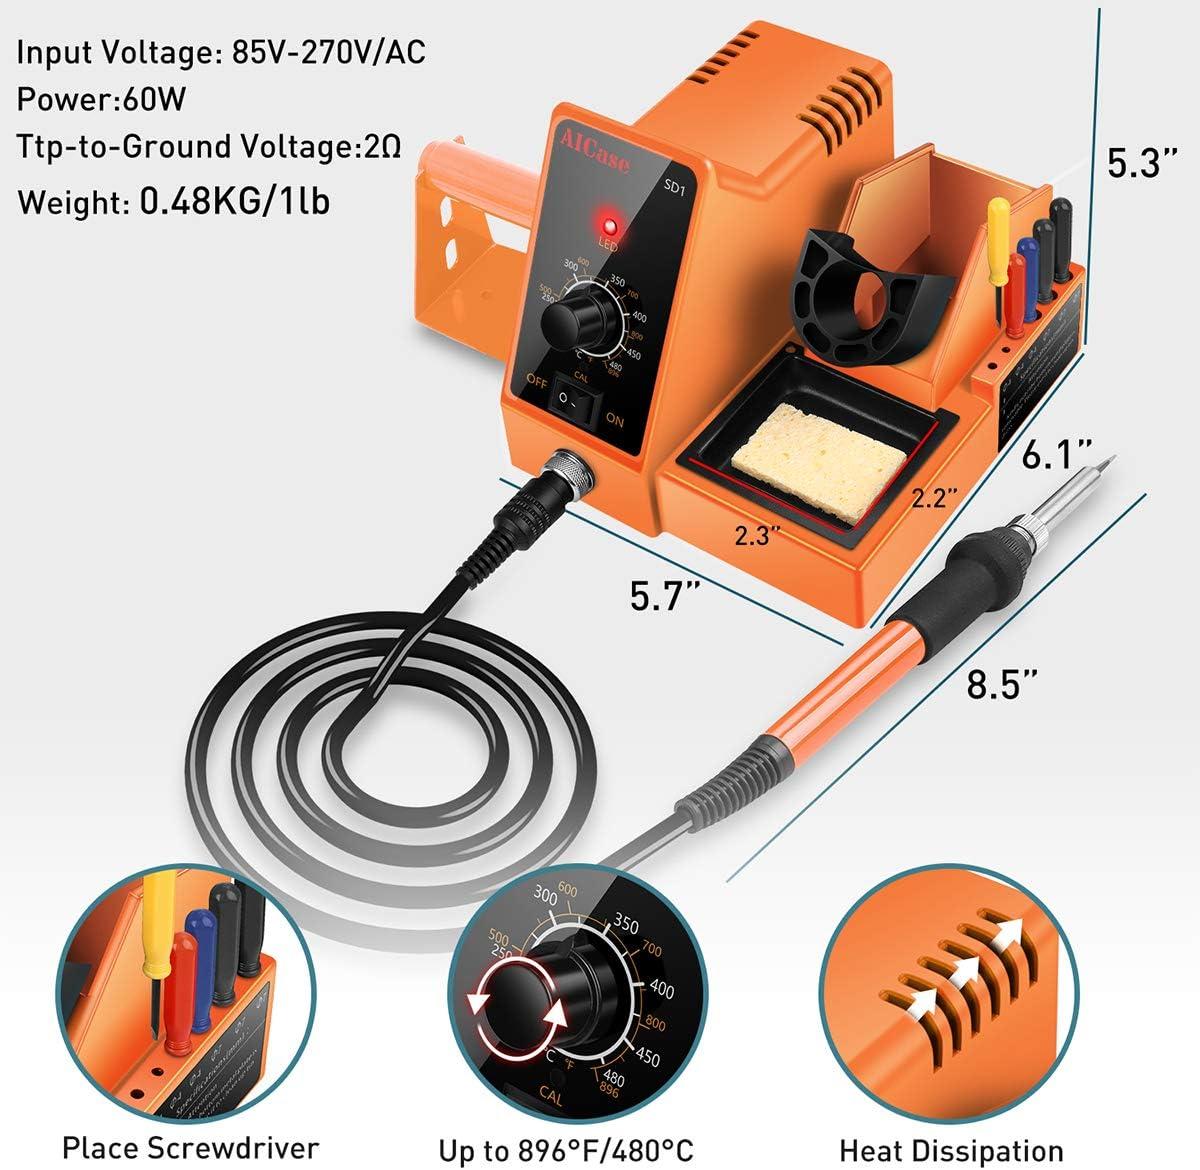 AICase Soldering Iron Station, 60-Watt, 110 Volt, 392°F-896°F (C/F) Temperature Adjustable, 6 Seconds Rapid Heating Anti-Static Solder Iron Station Kit with Solder Roll Holder/Screwdriver Holder